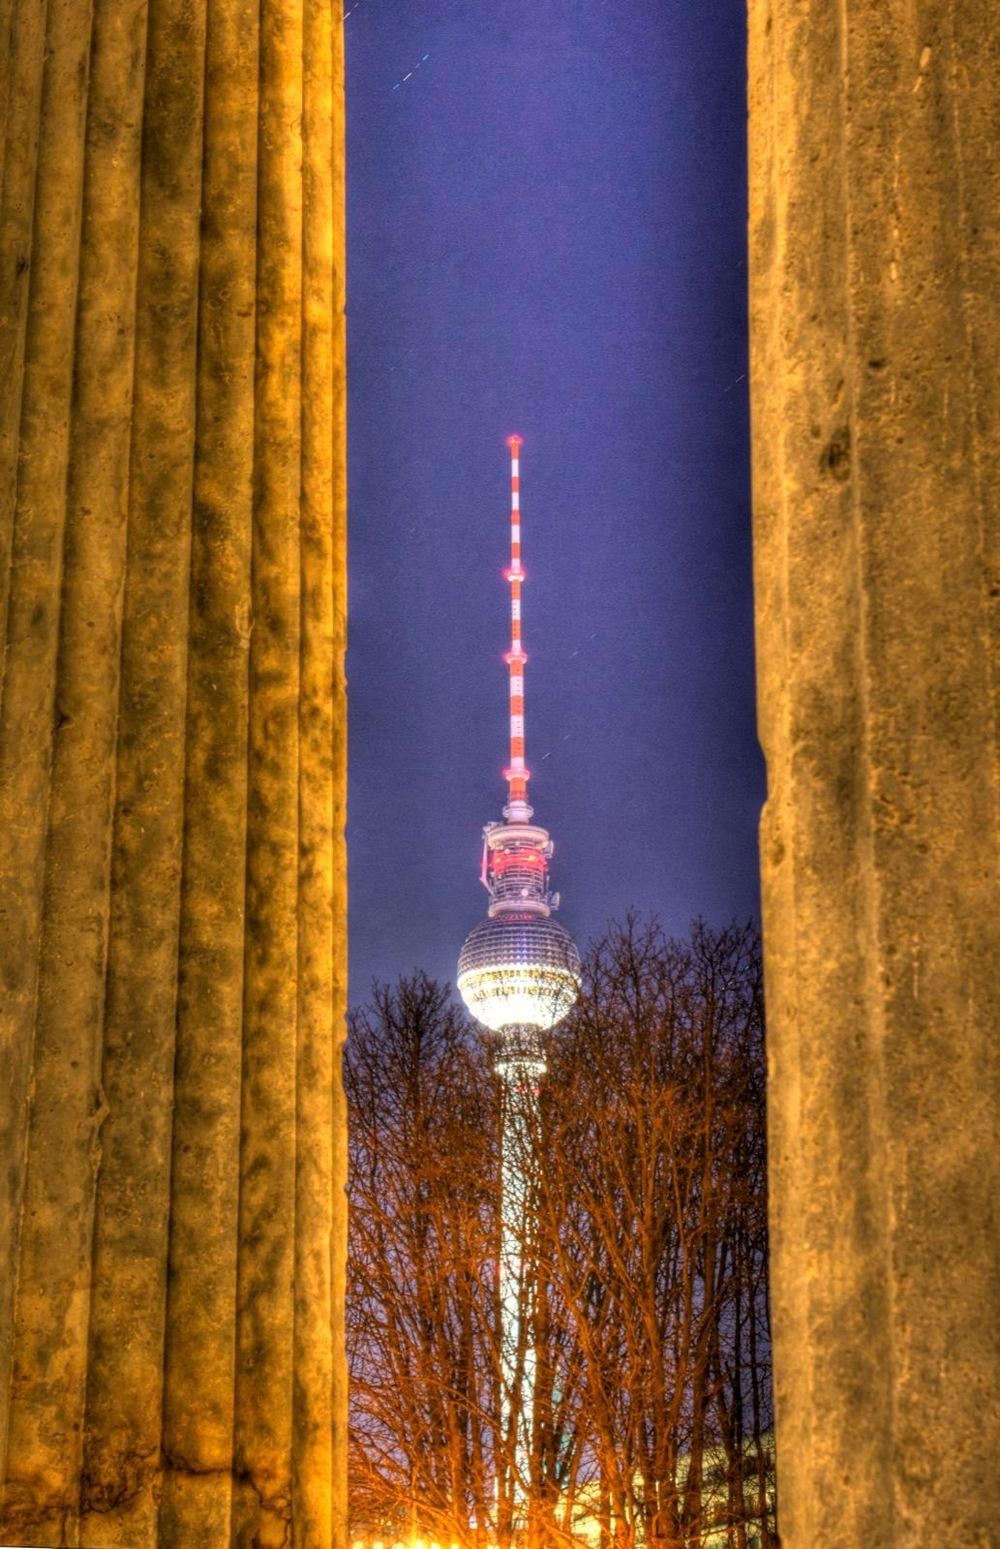 HDR Berlin 3:13 19.jpg